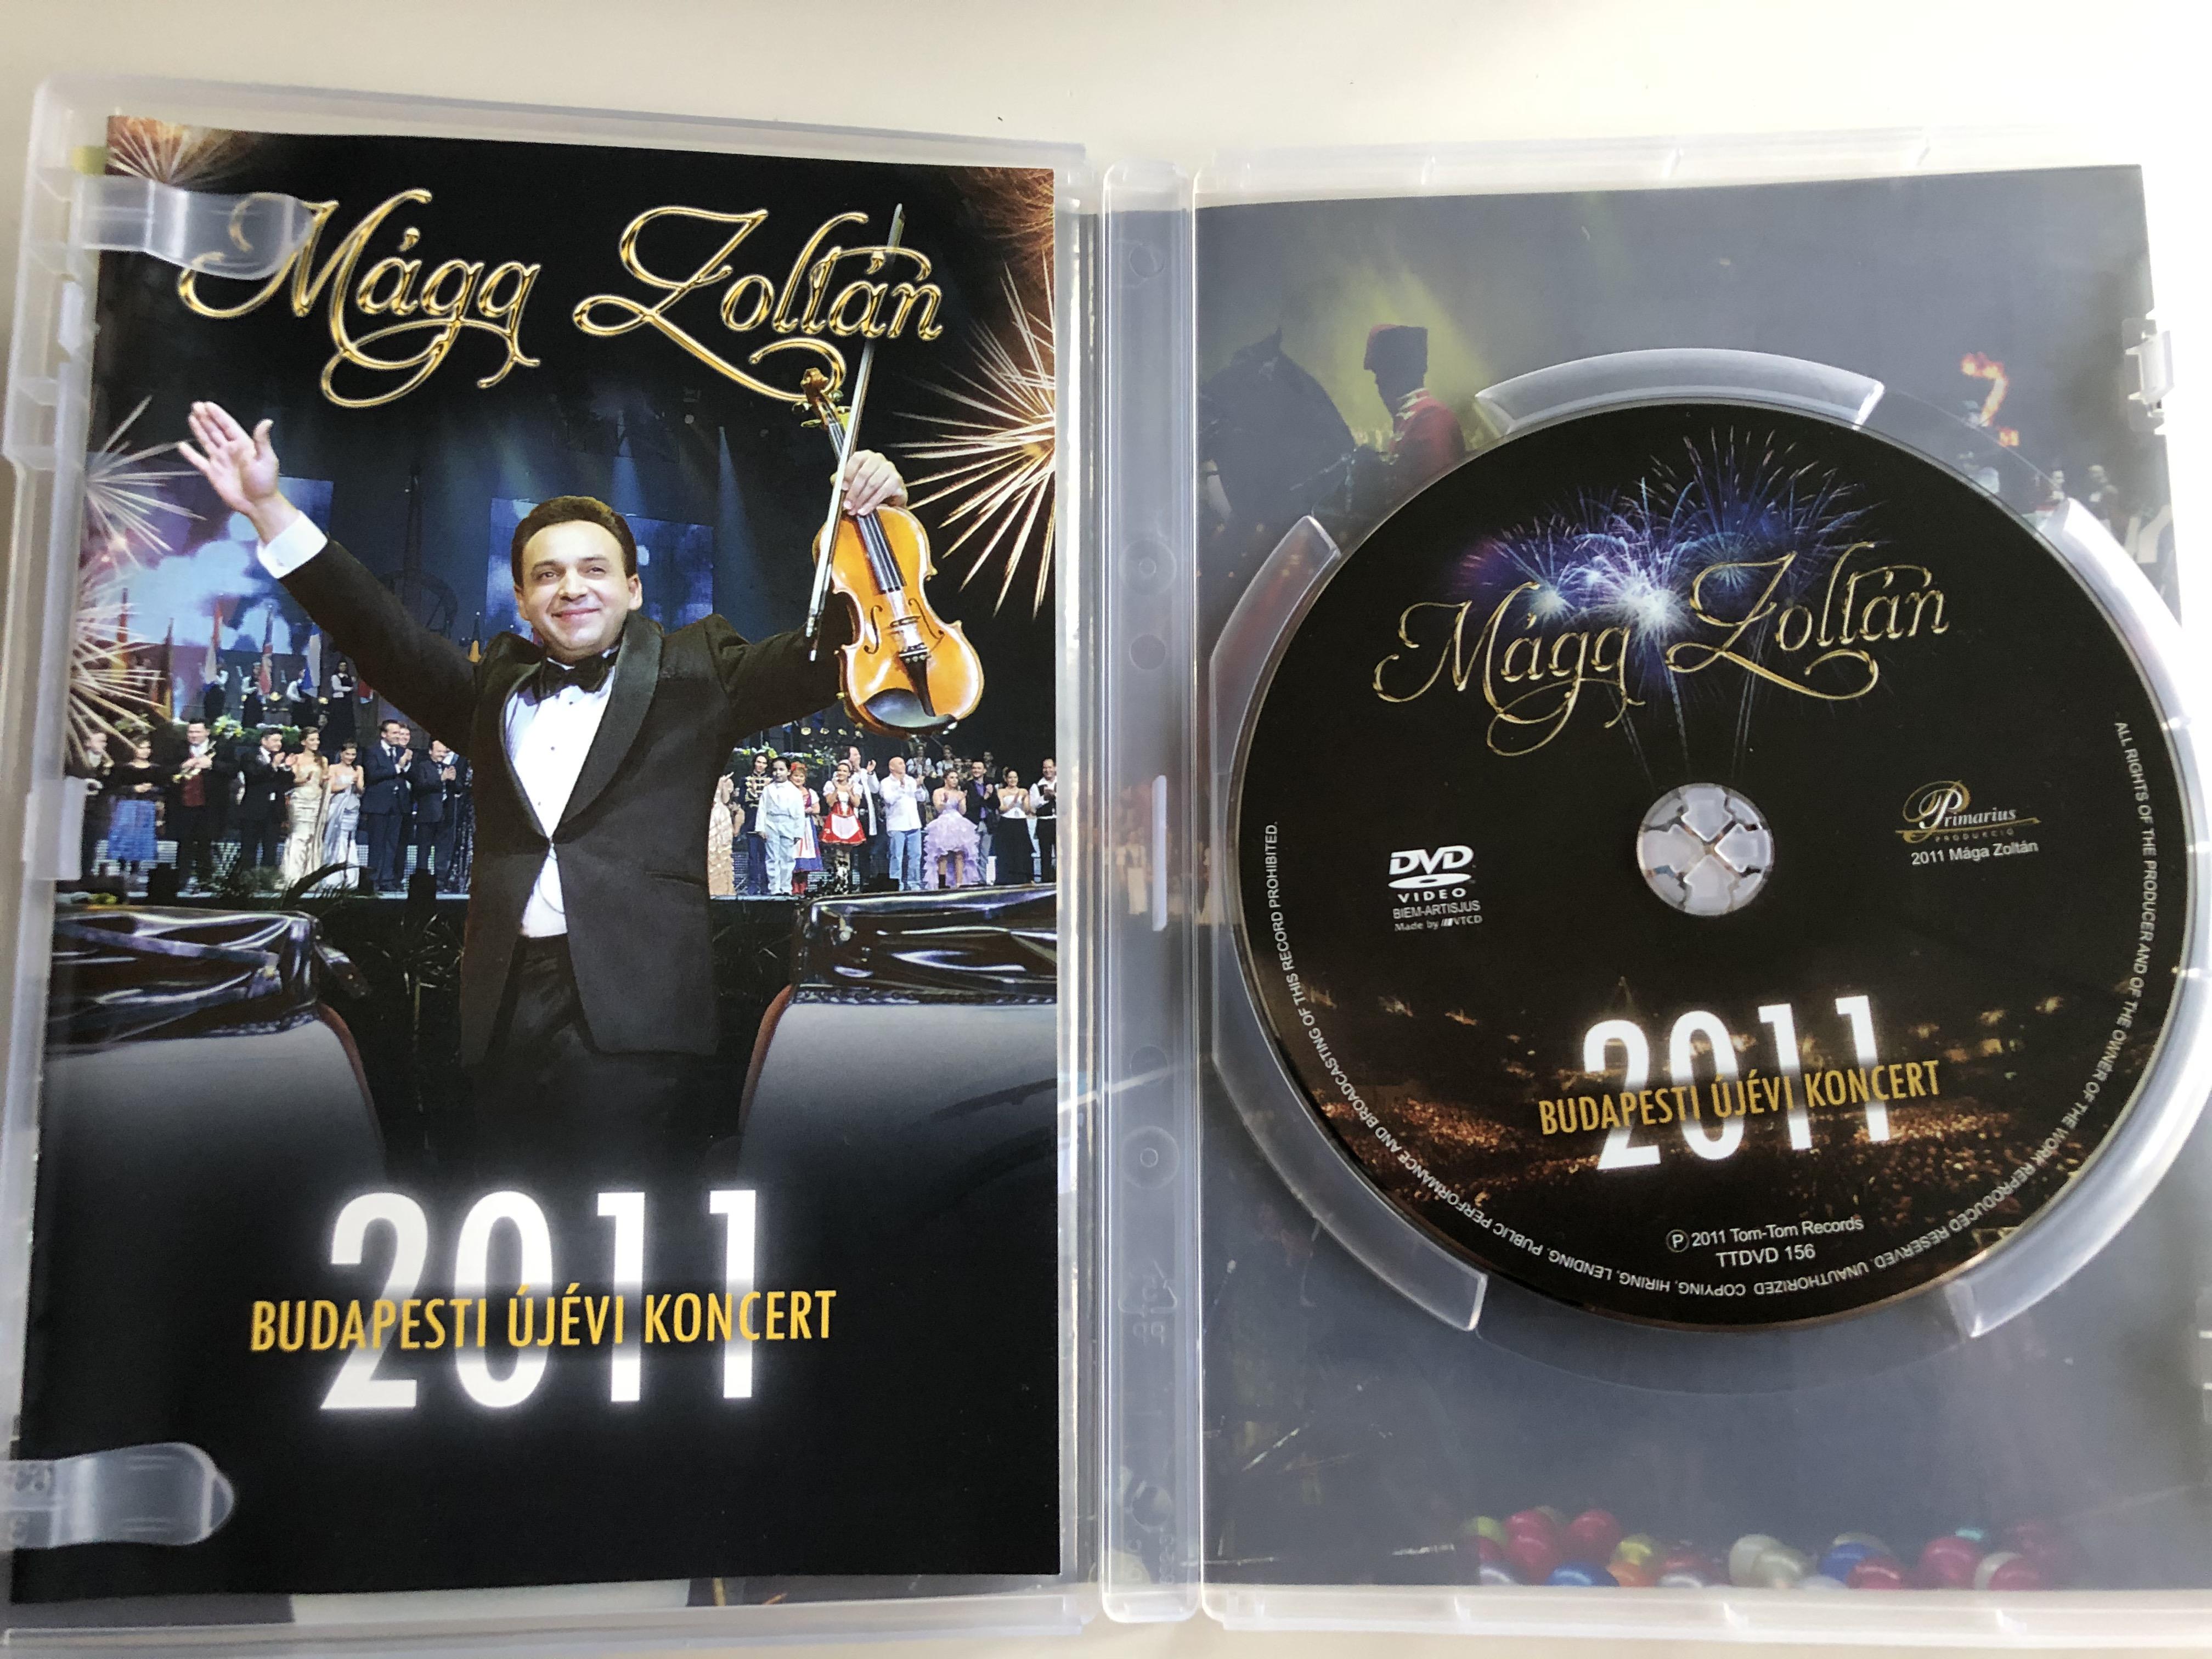 m-ga-zolt-n-2011-budapesti-j-vi-koncert-dvd-2011-tom-tom-records-ttdvd-156-2-.jpg